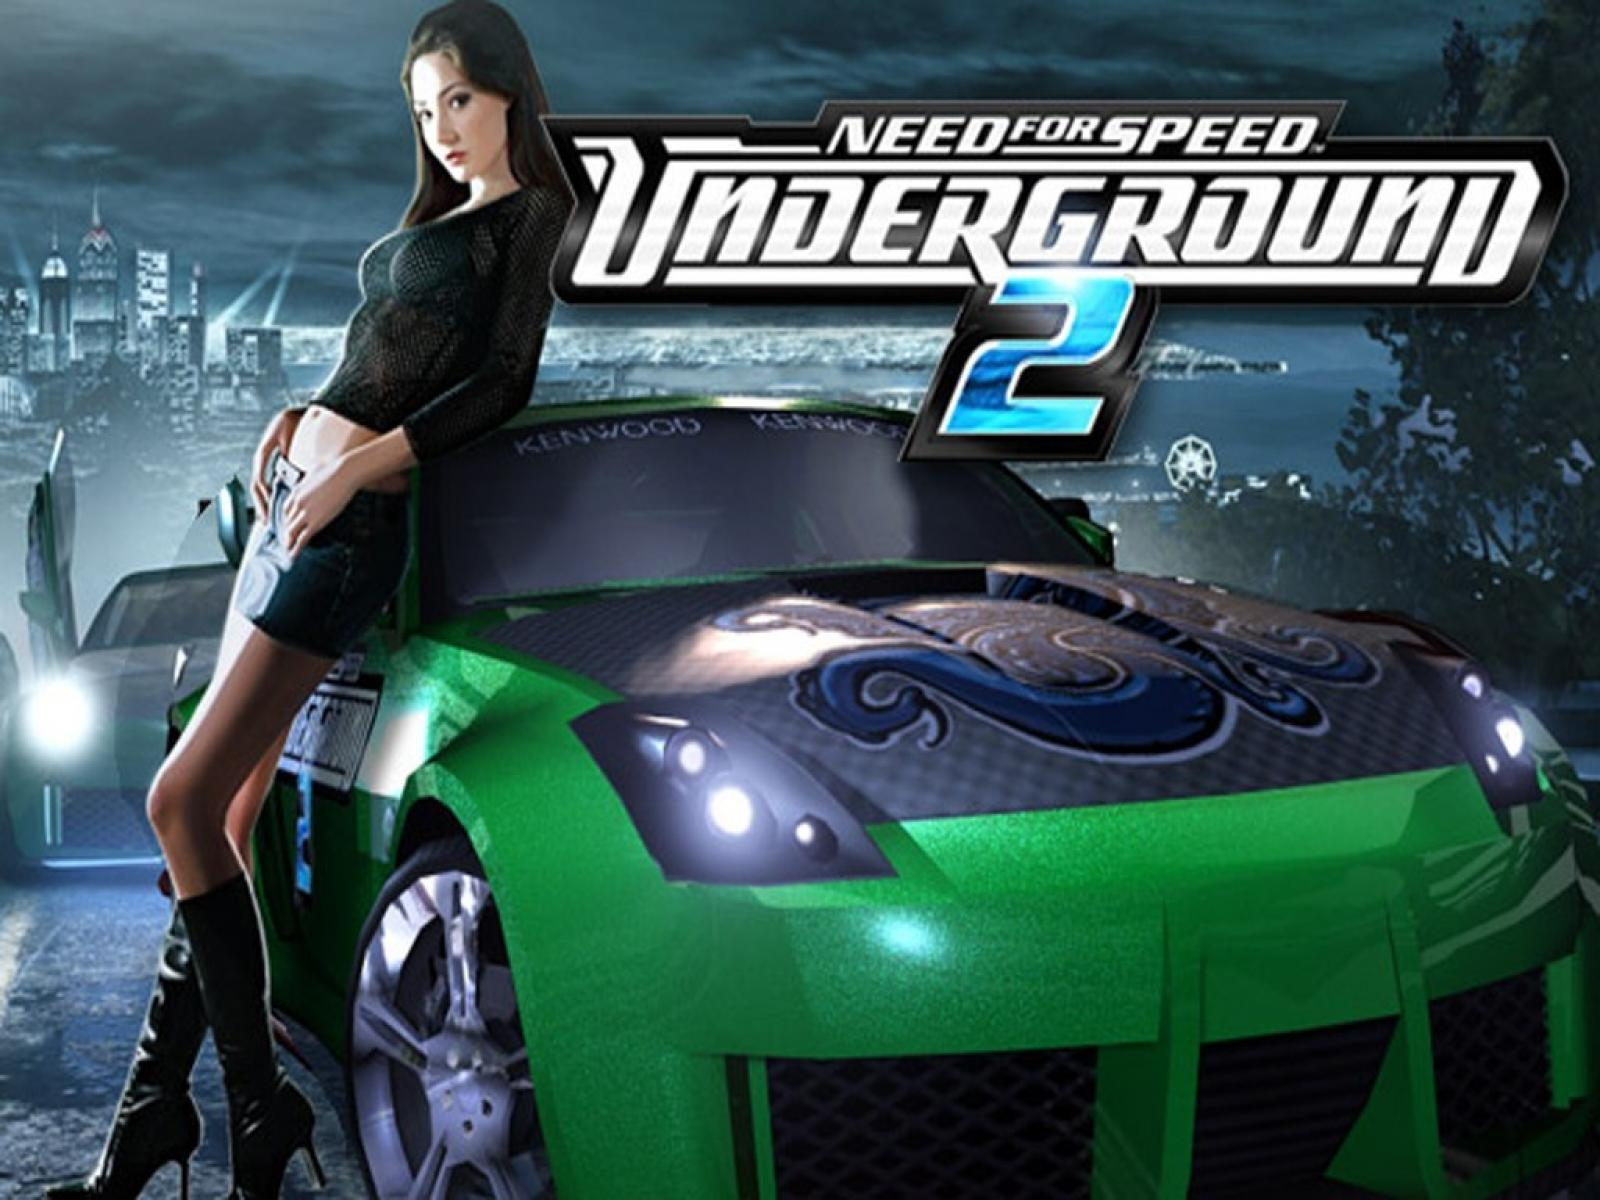 http://pro-nfs.ru//wp-content/uploads/2020/01/need_for_speed_underground_2_001_1600_x_1200.jpg